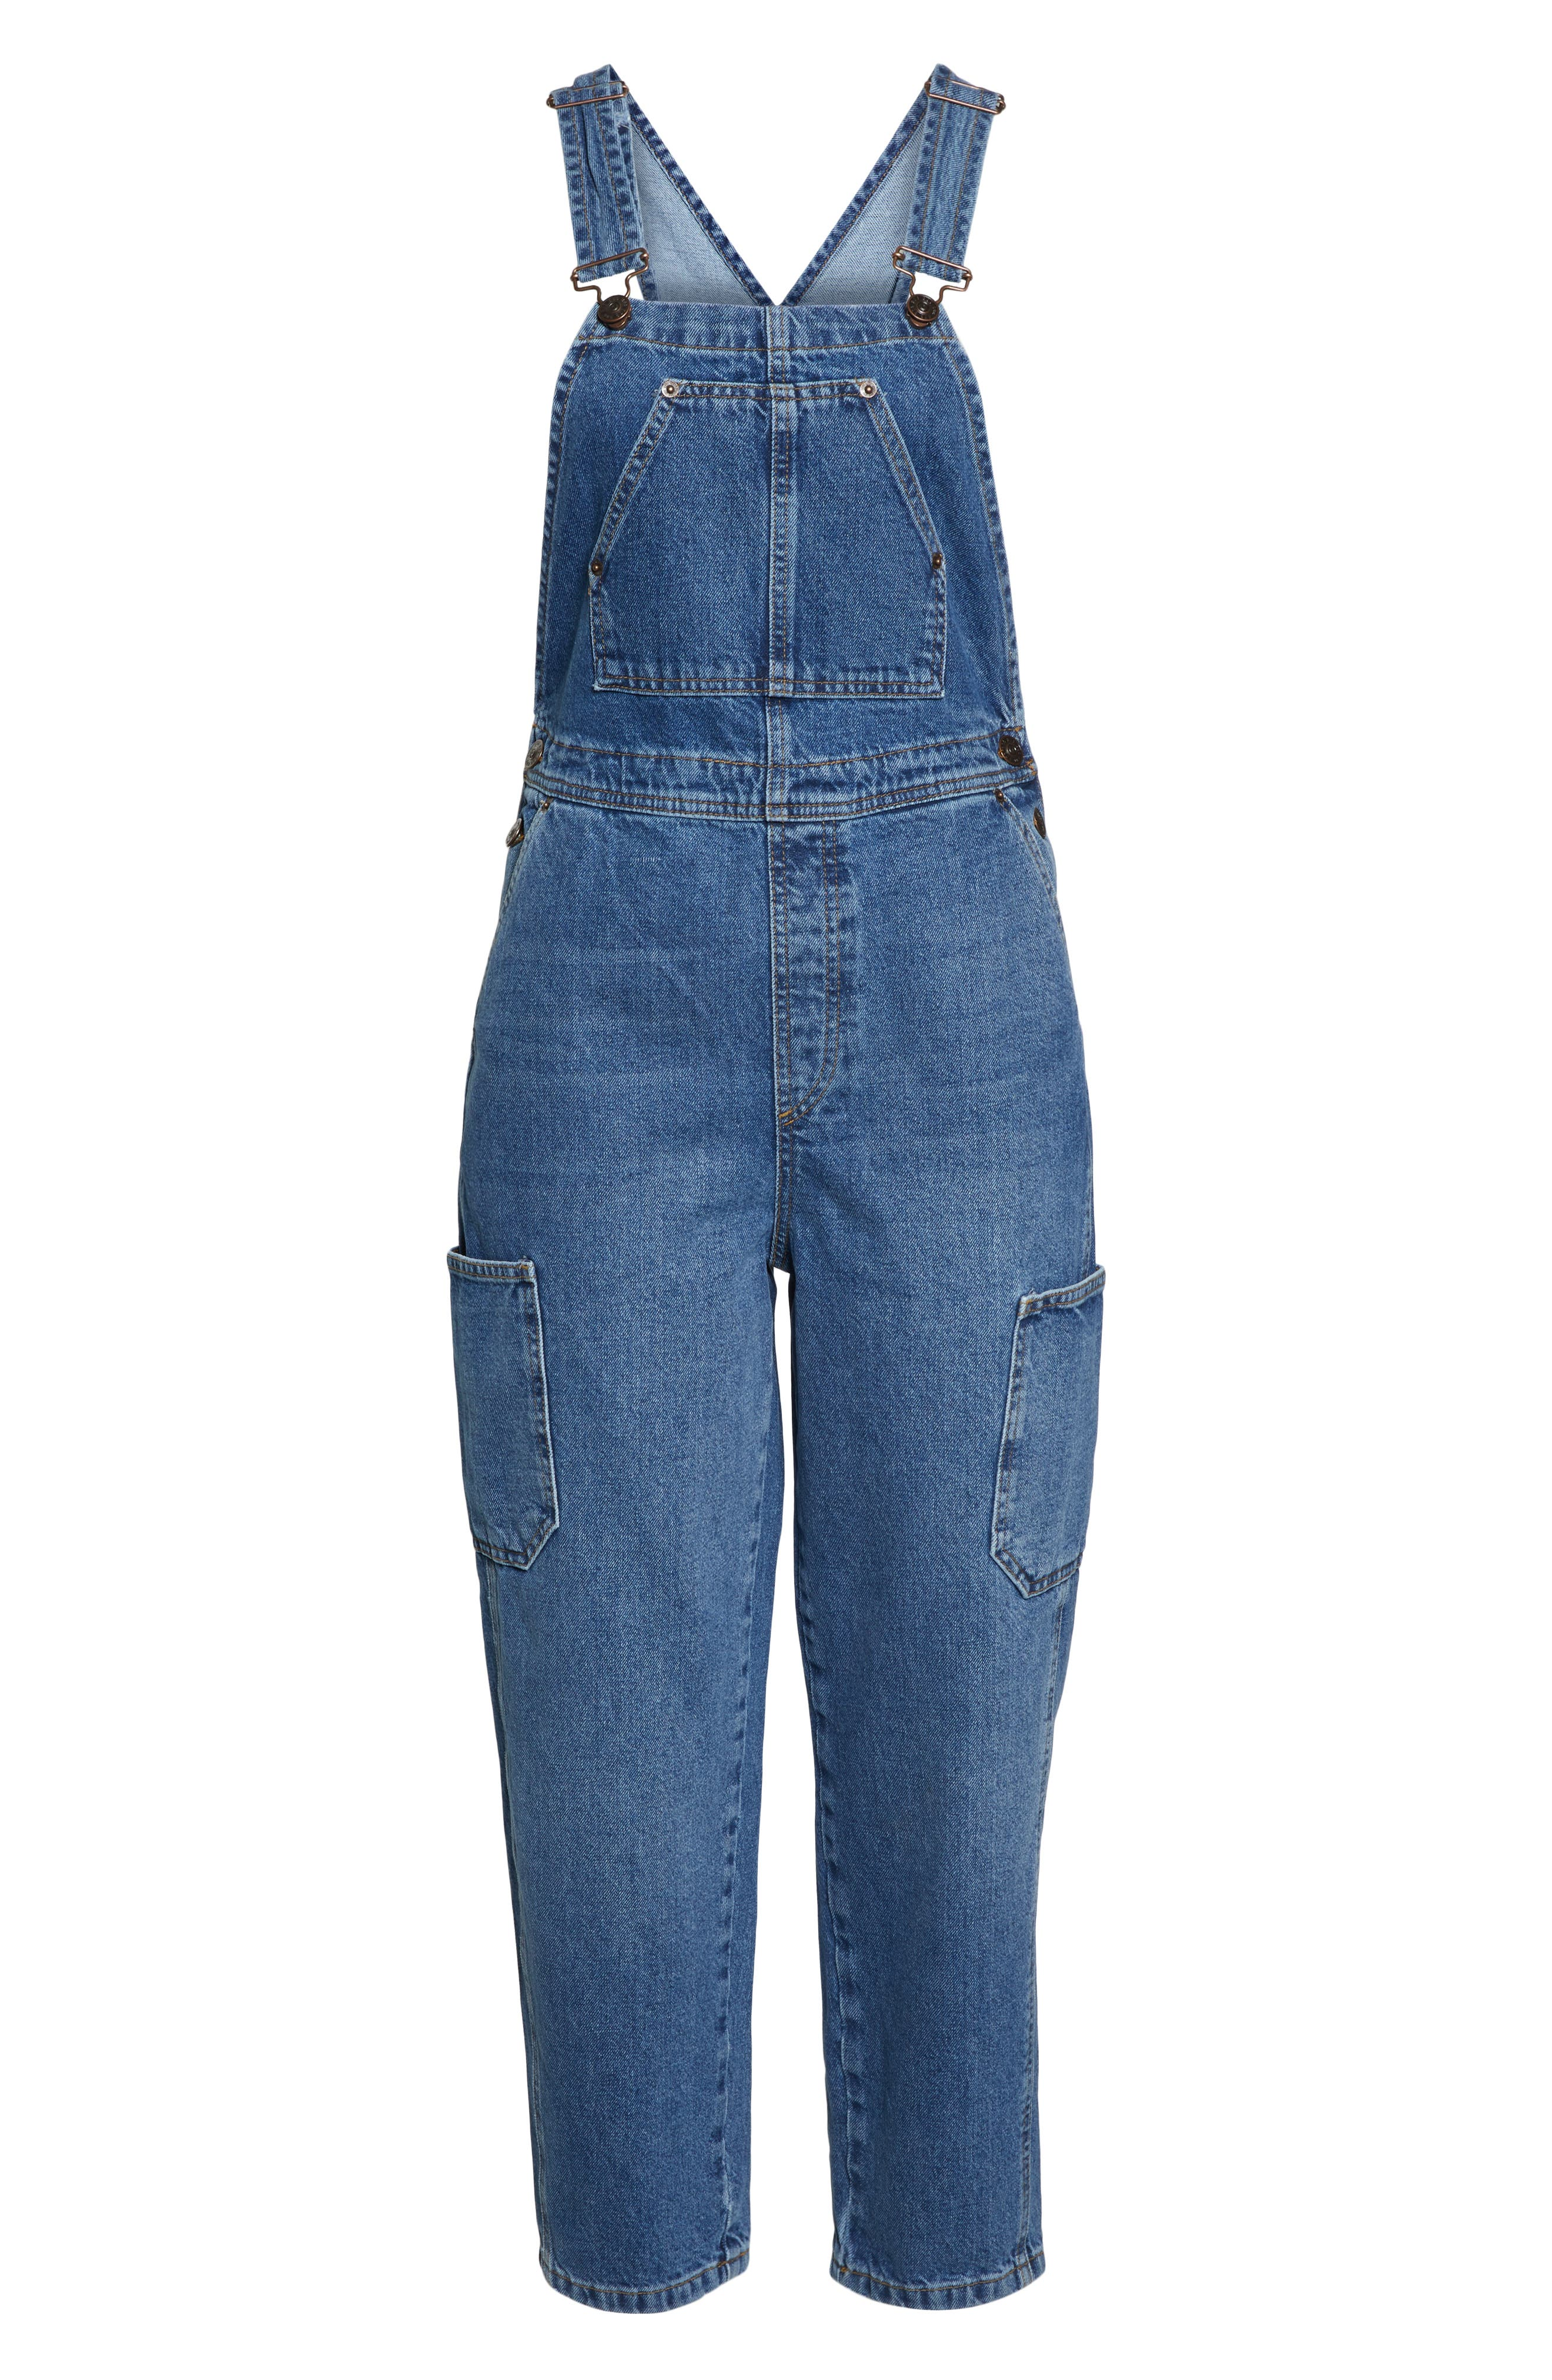 Urban Outfitters Workwear Denim Overalls,                             Alternate thumbnail 6, color,                             DENIM BLUE